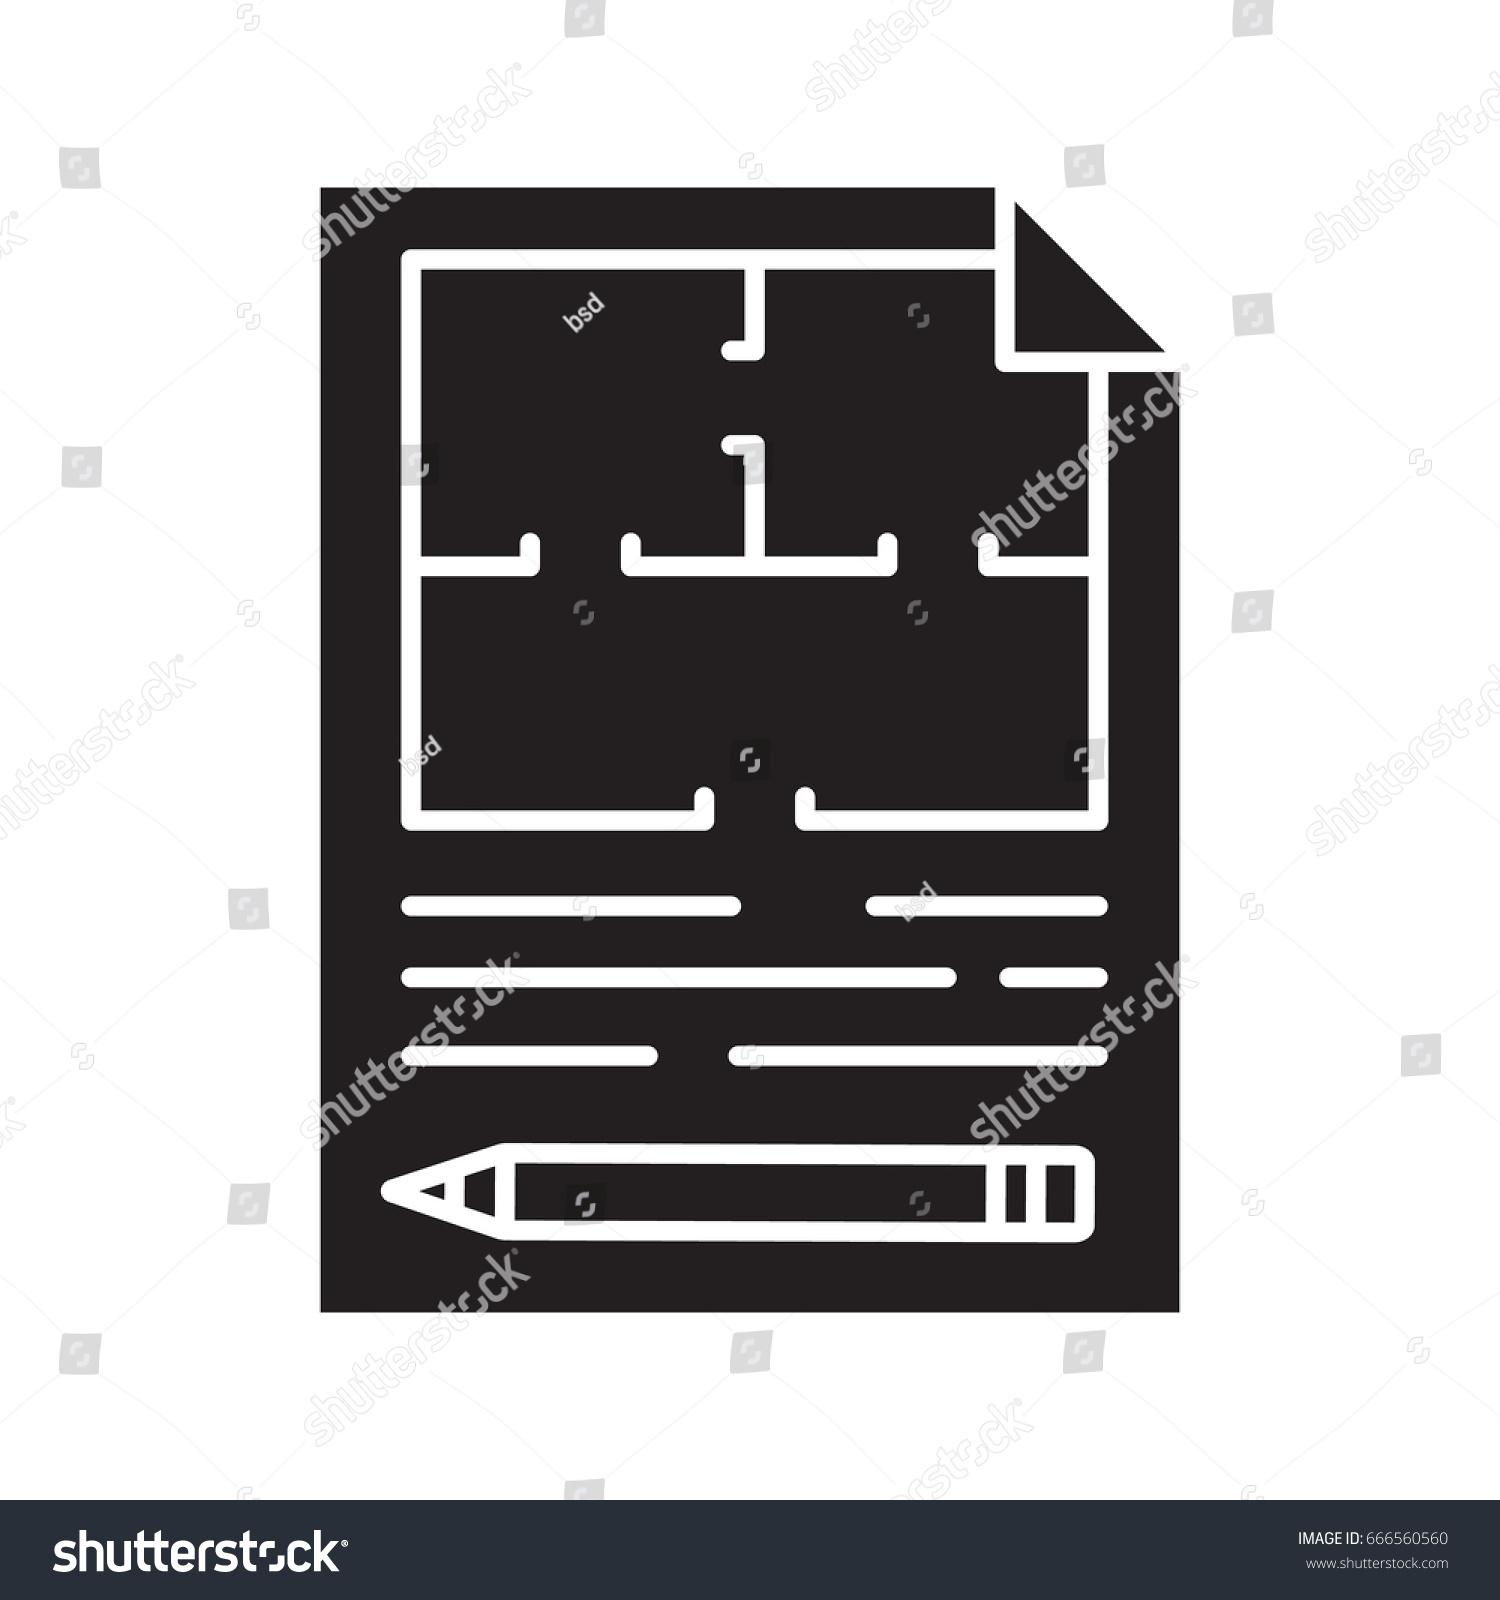 Floor plan flat blueprint pencil glyph stock vector 666560560 floor plan flat blueprint with pencil glyph icon apartment layout silhouette symbol house malvernweather Images